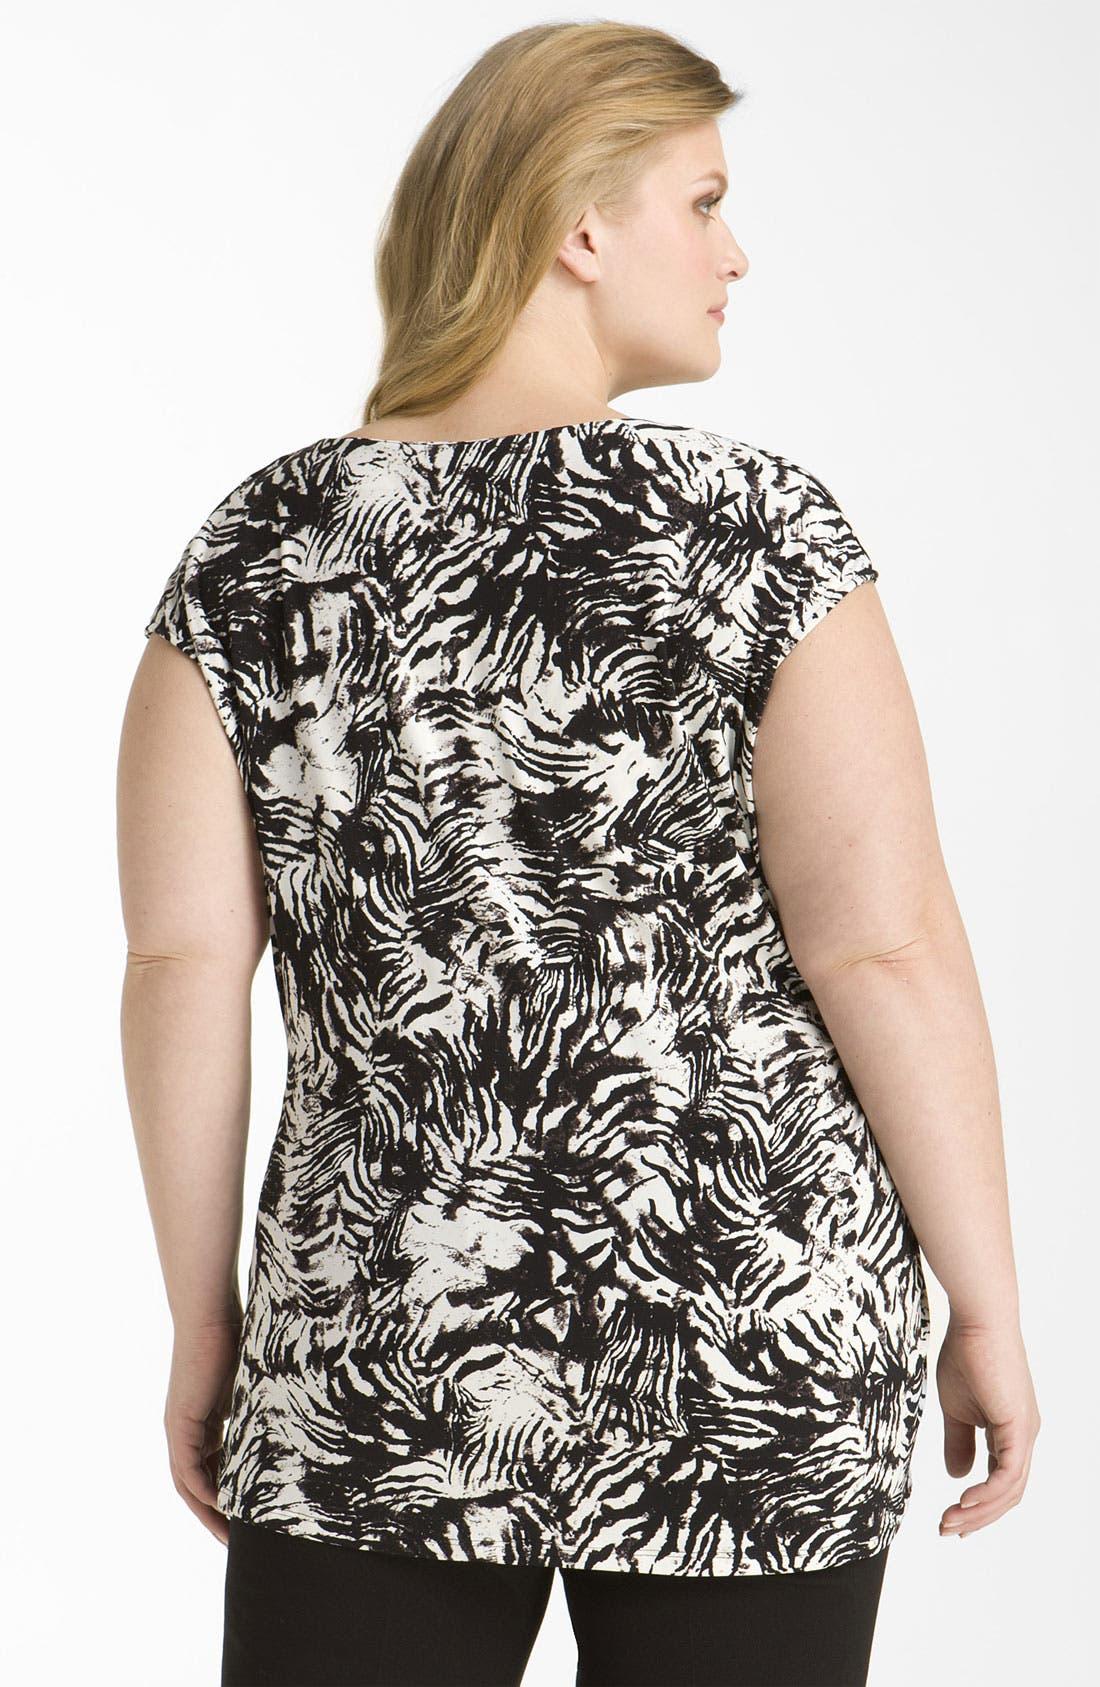 Alternate Image 2  - Vince Camuto 'Zebra Skin' Cap Sleeve Top (Plus)